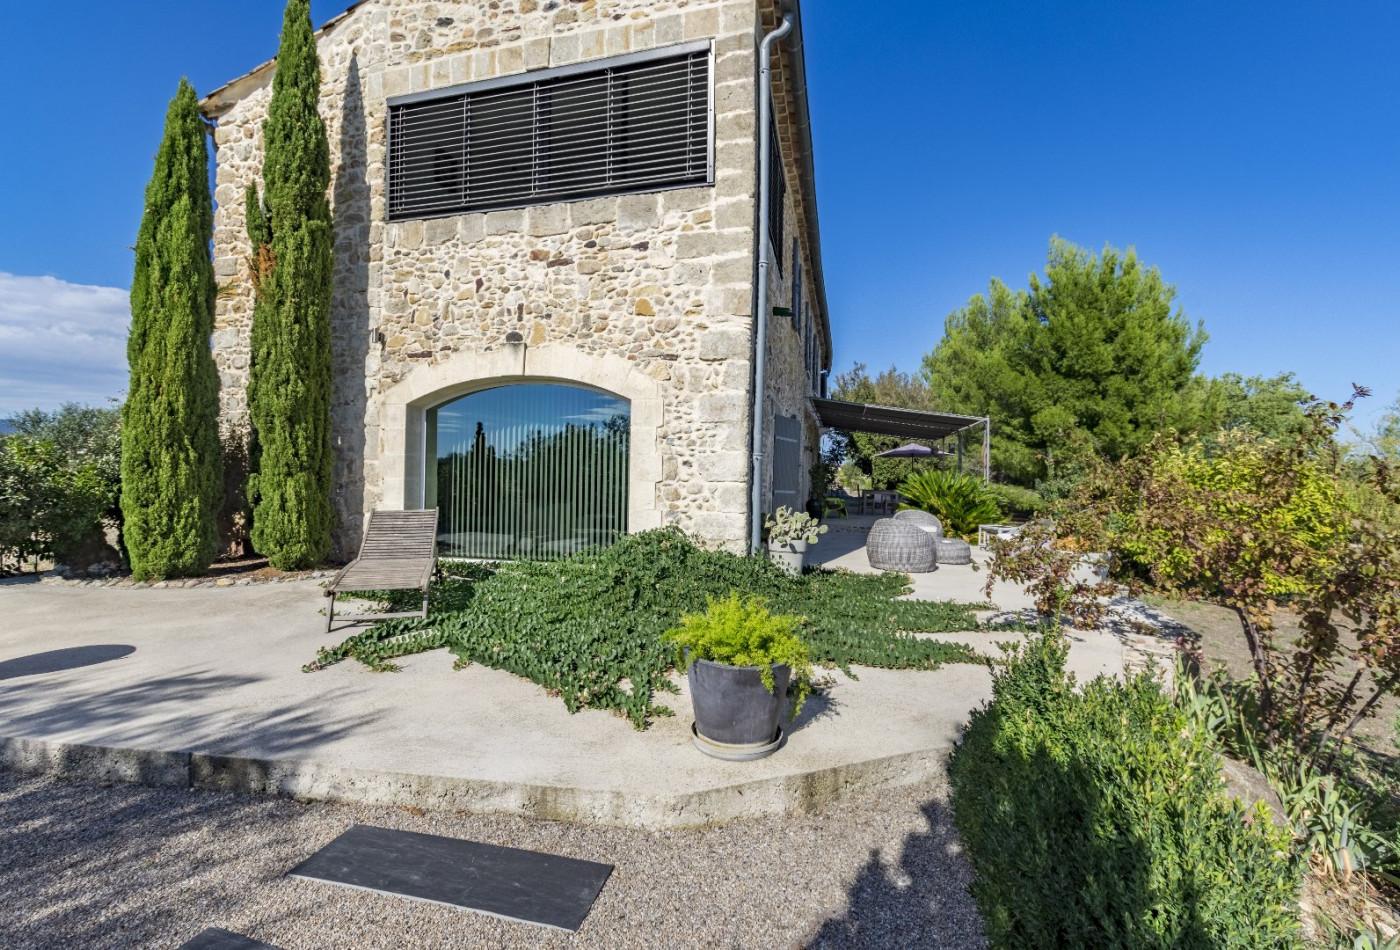 A vendre  Montpellier | Réf 340138324 - Agence galerie casanova